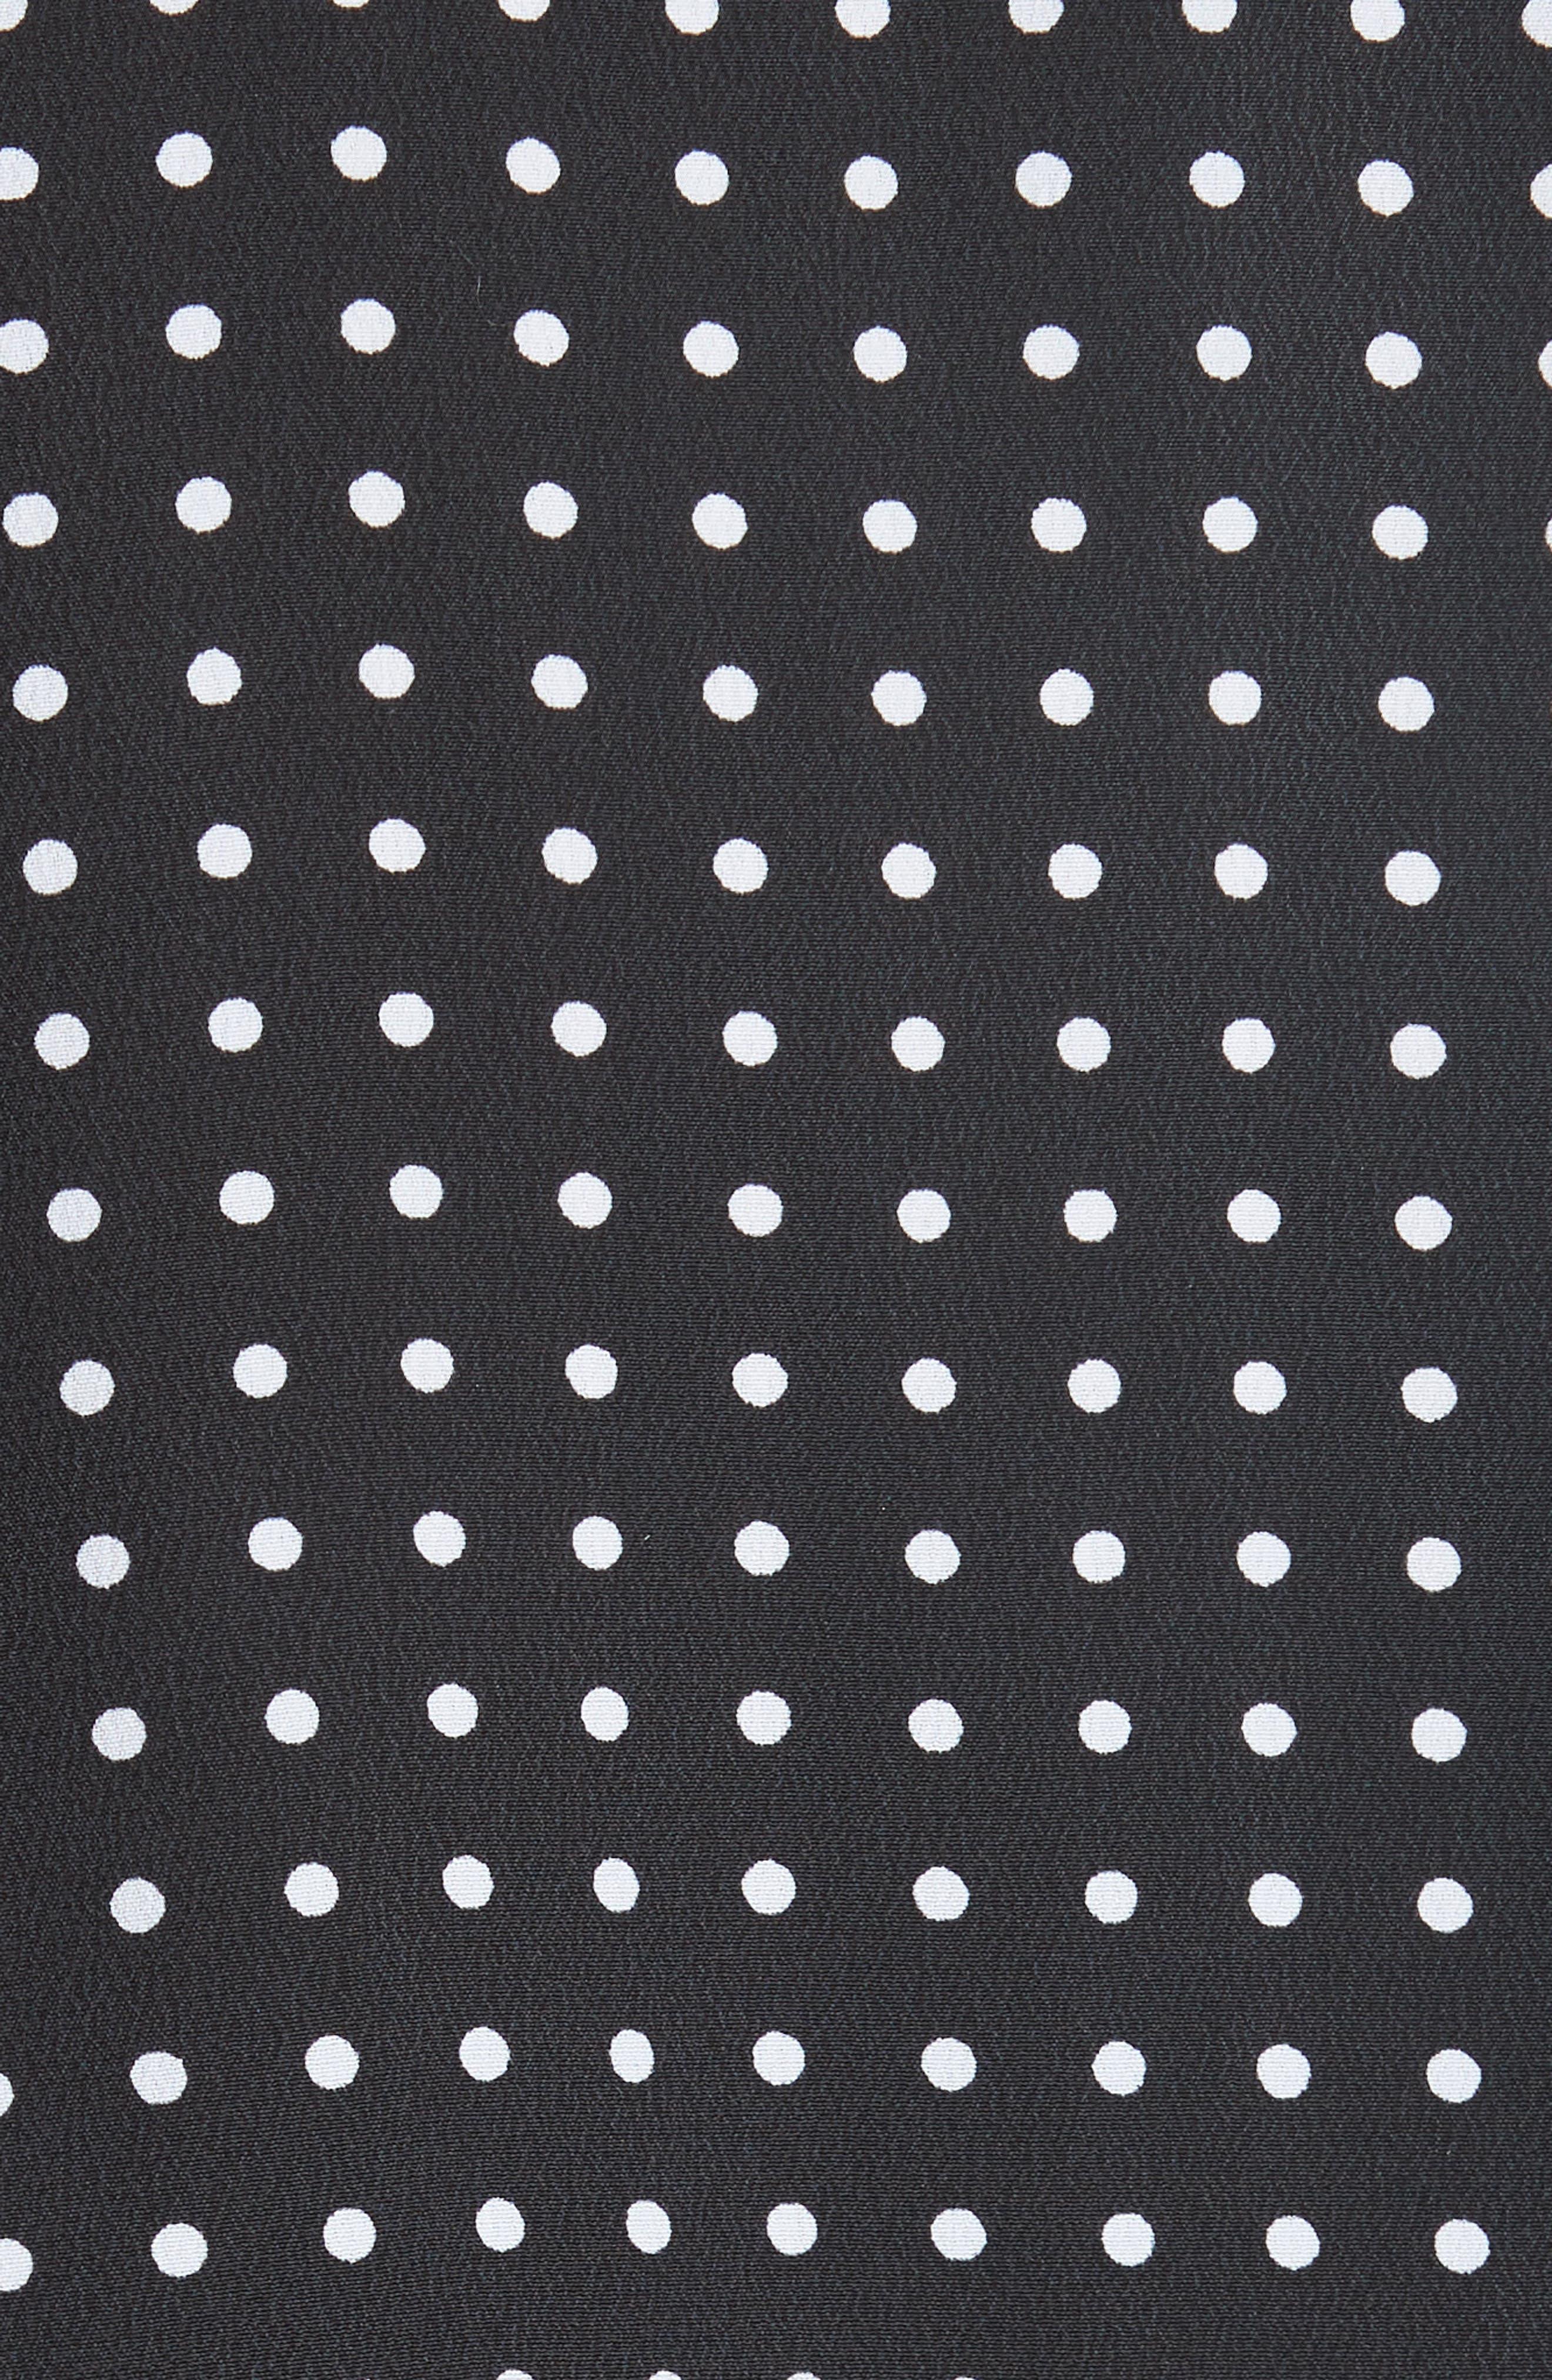 Polka Dot Plunge Silk Blouse,                             Alternate thumbnail 5, color,                             TRUE BLACK/ BRIGHT WHITE